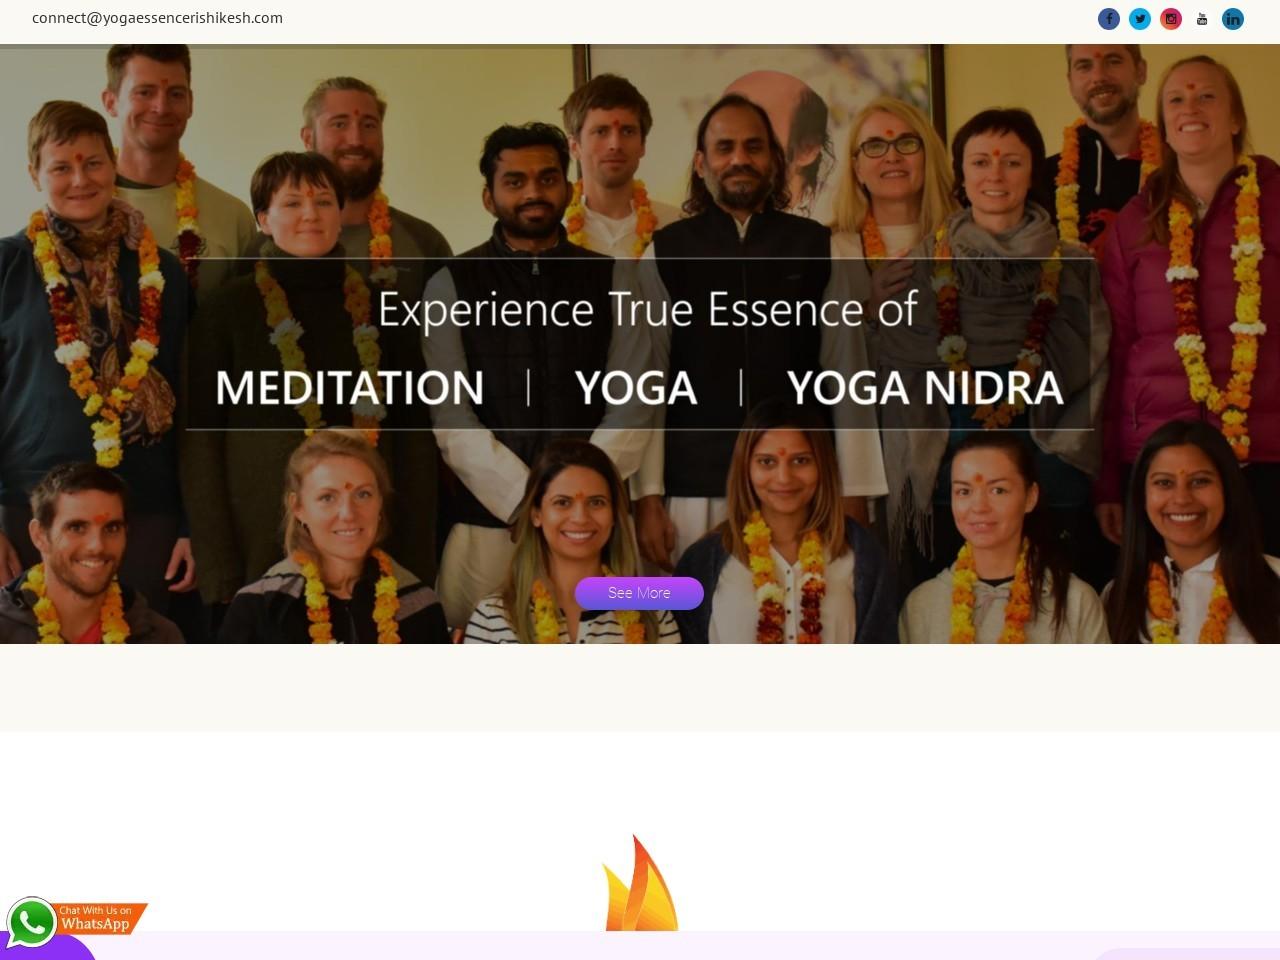 Online 100 hour Meditation teacher training